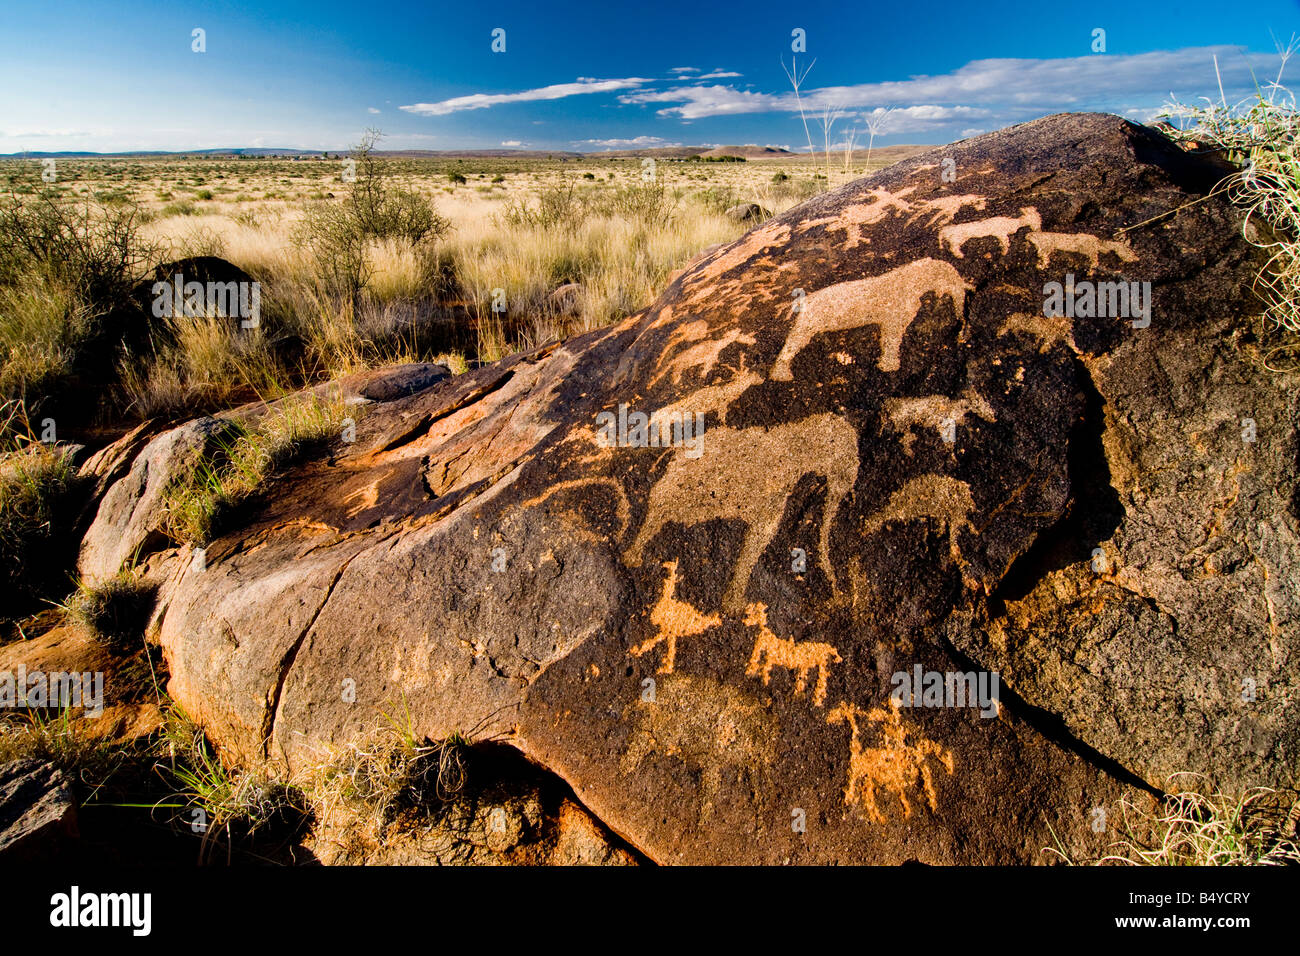 Bushmen, petroglyphs, Kenhardt, Northern Cape, South Africa - Stock Image